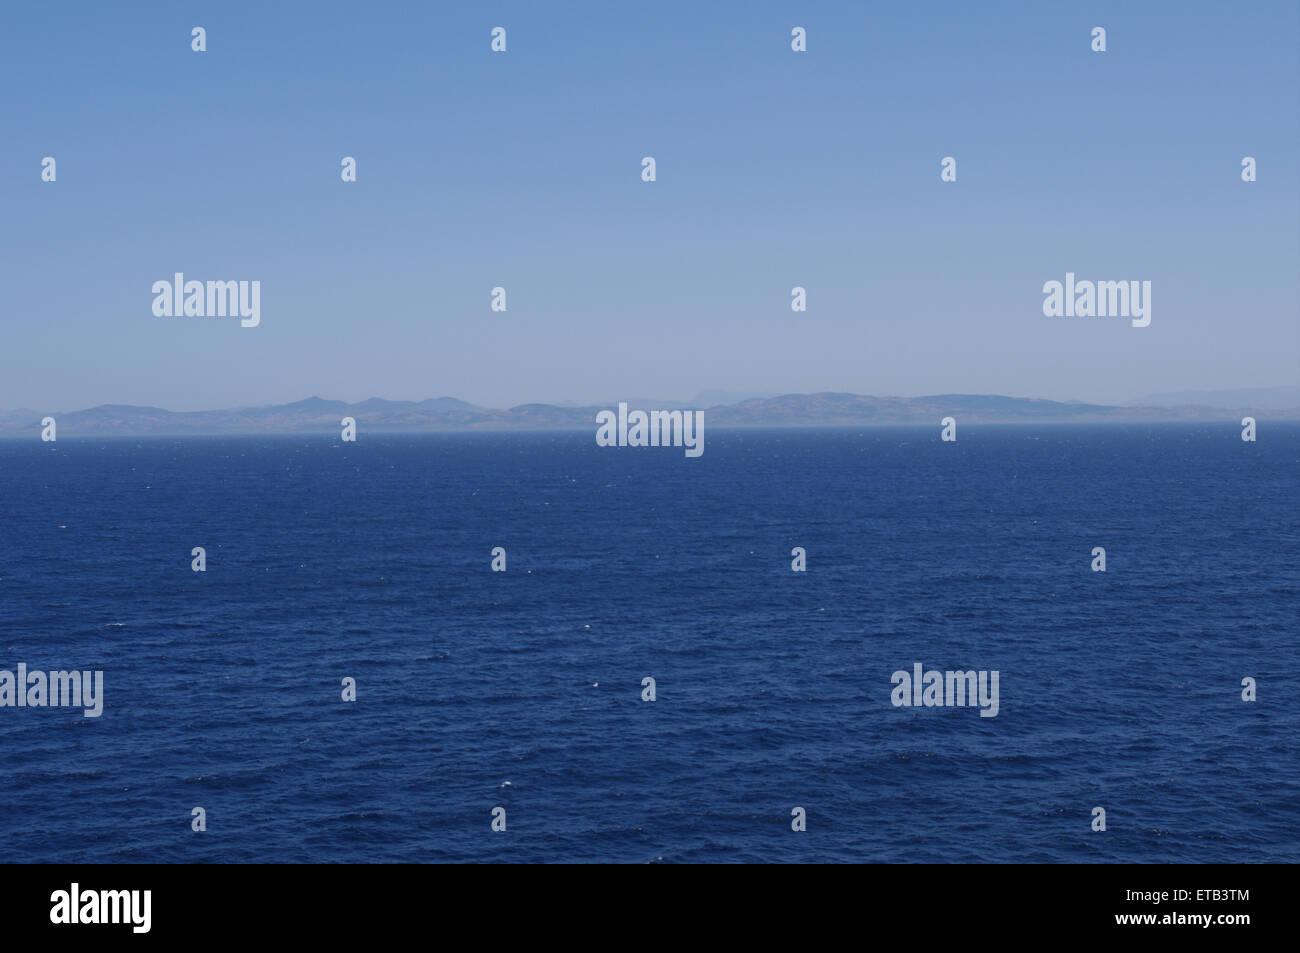 Land emerge from sea mist blue sea sky - Stock Image